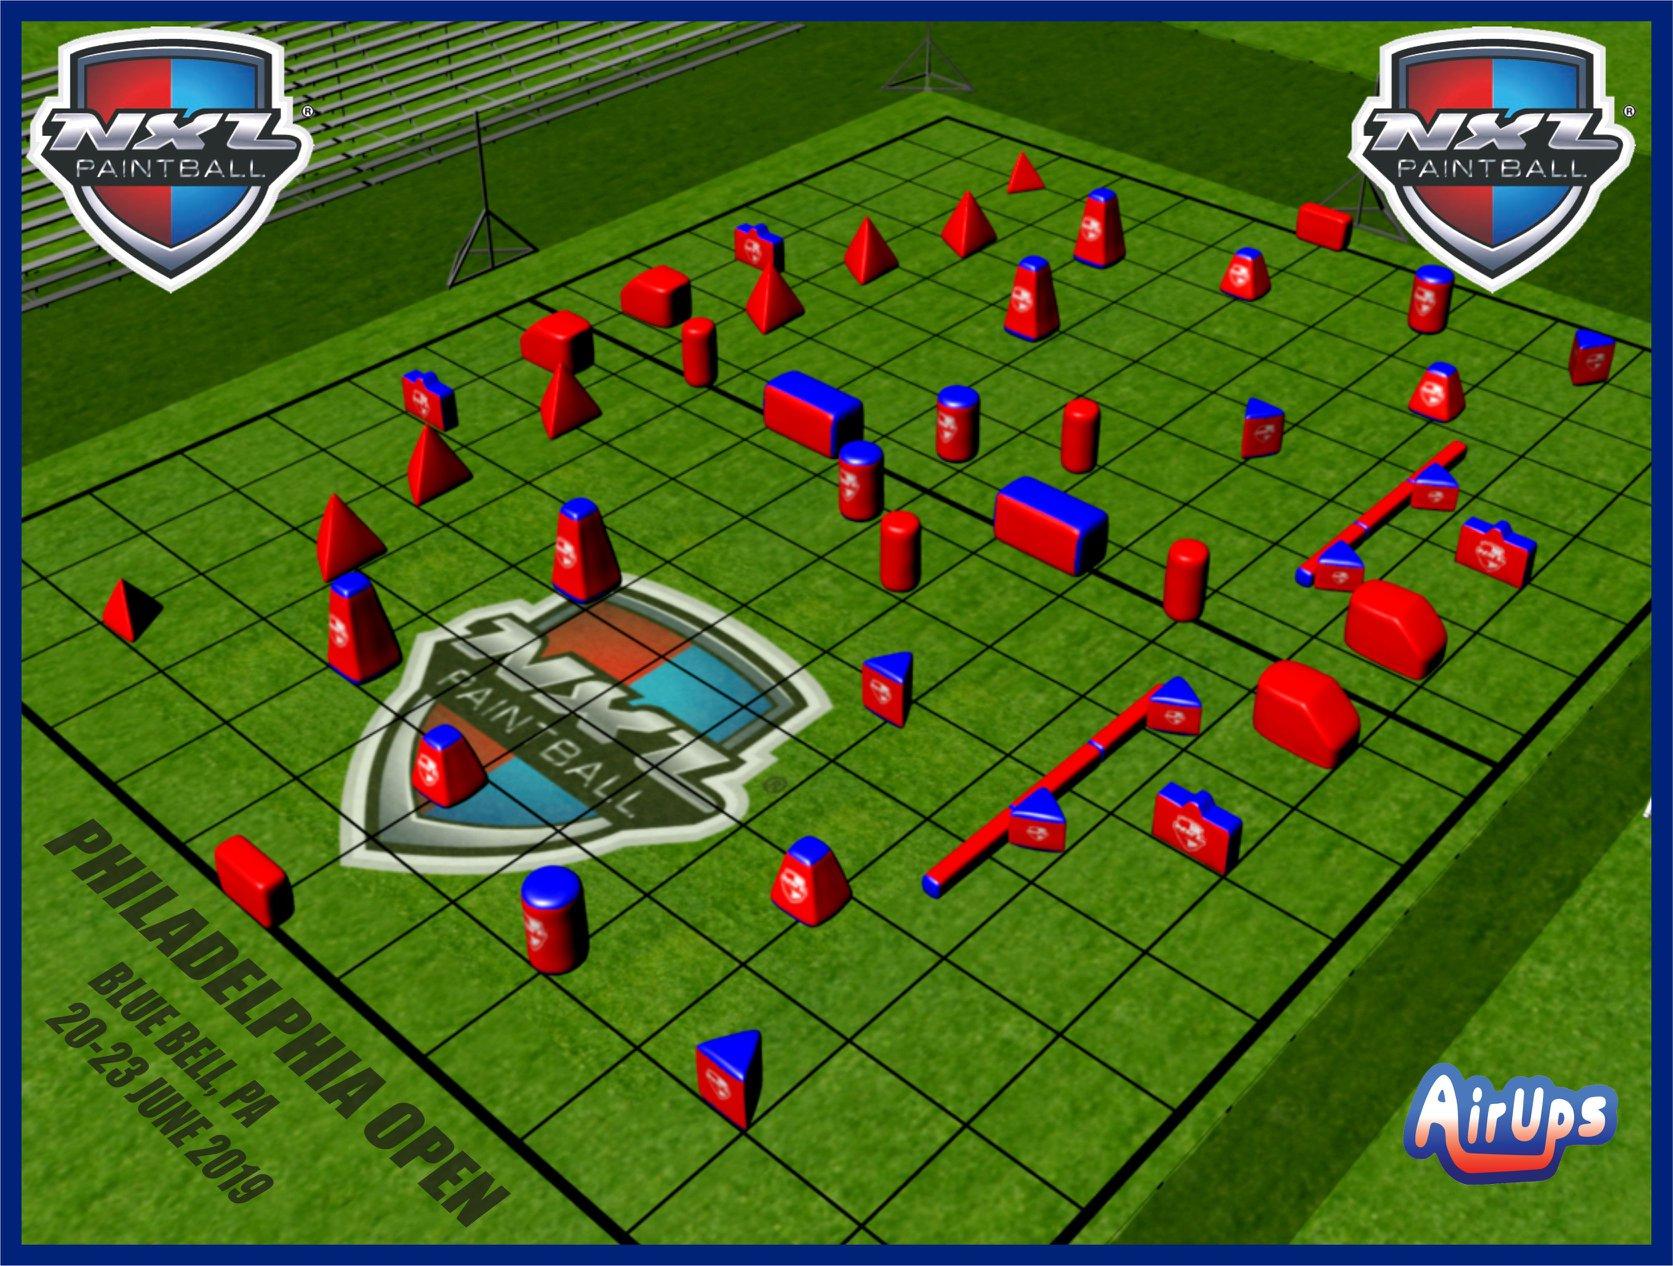 nxl2019_philadelphia_layout_2.jpg